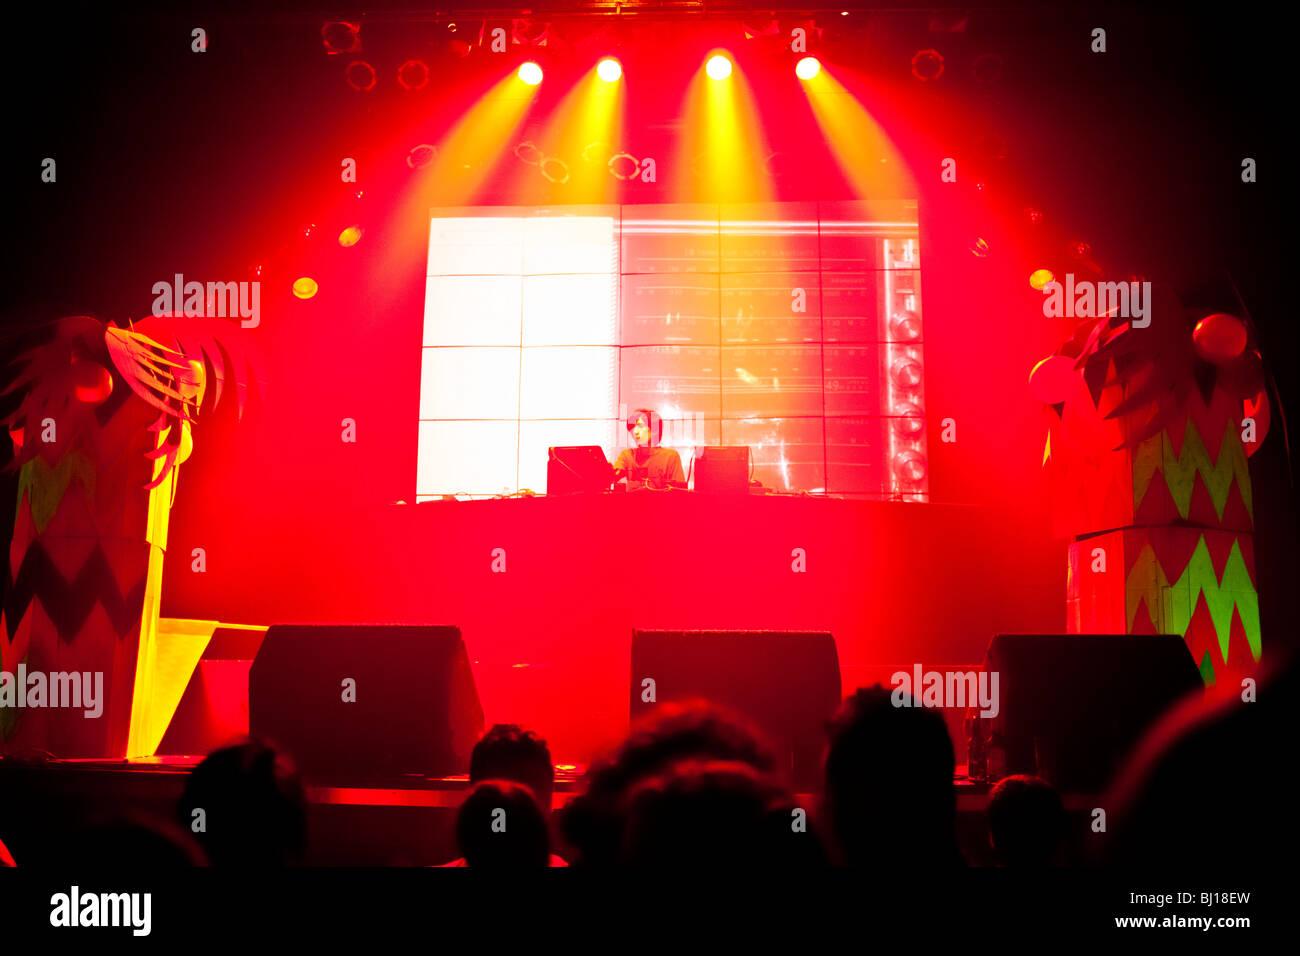 DJ Villa Diamante at Zizek Electro, Cumbia and Reggaeton party at Niceto Club, Buenos Aires - Stock Image